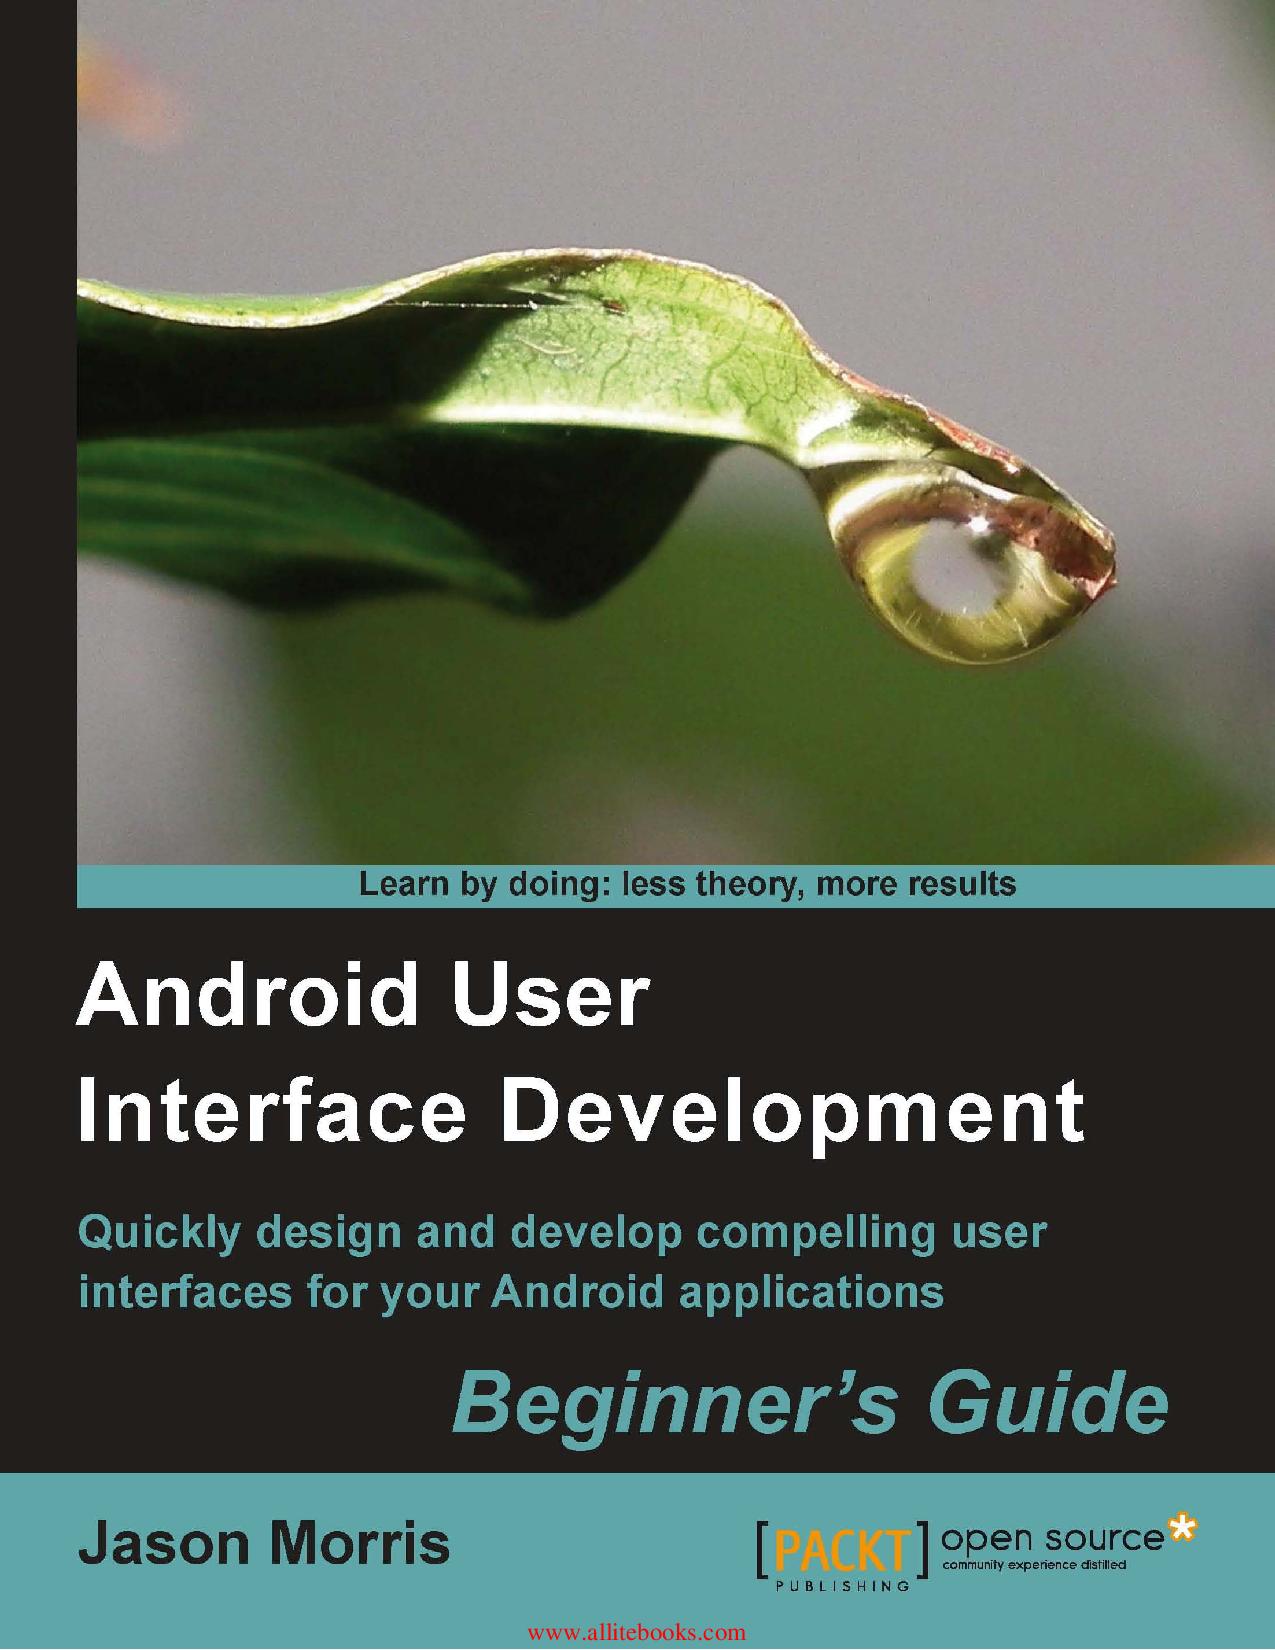 Android User Interface Development Beginner s Guide